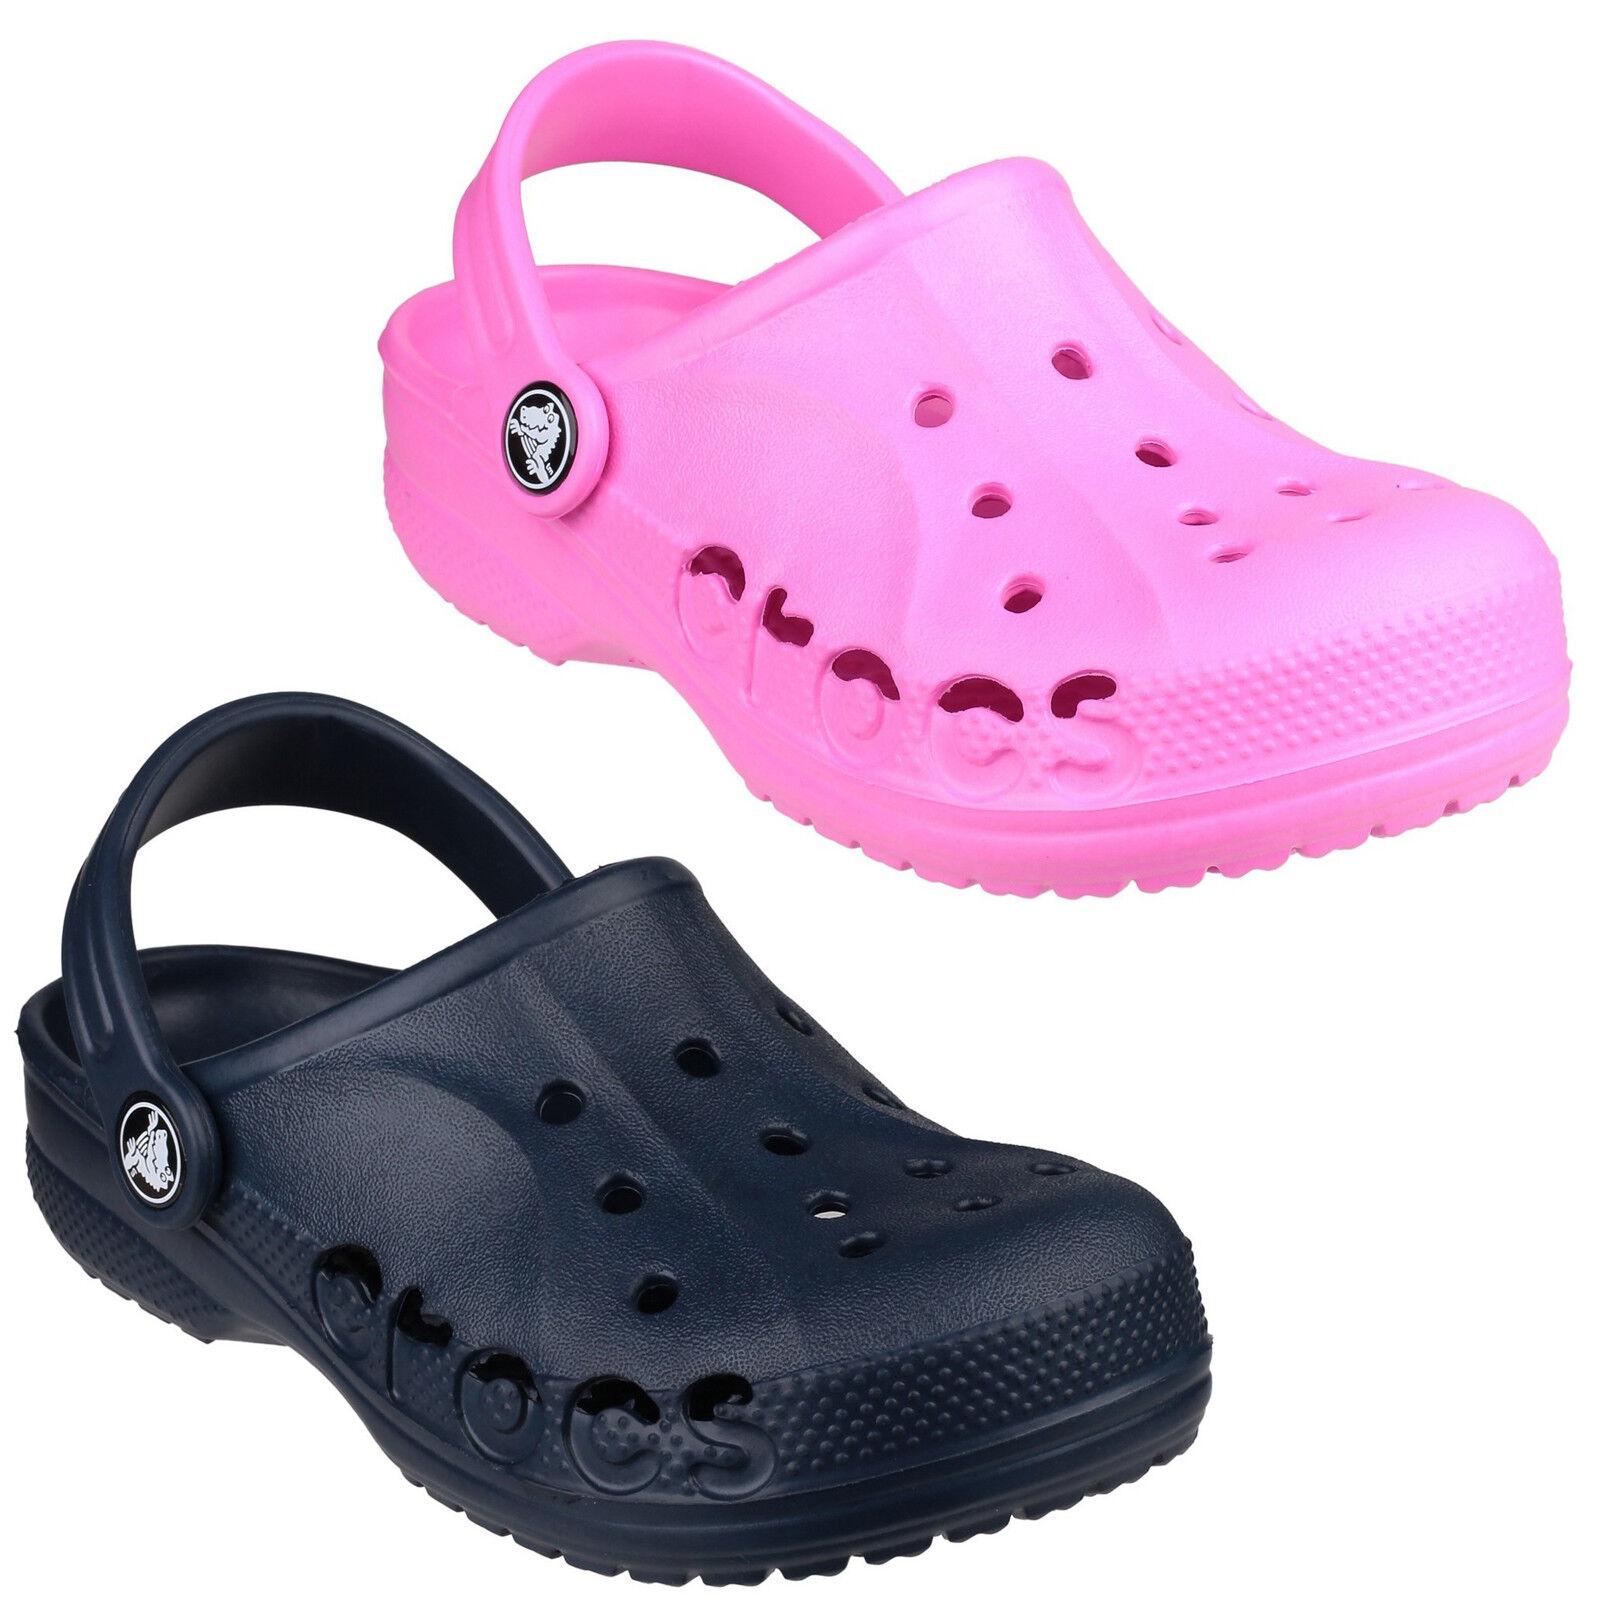 Crocs Baya Clogs Childrens Croslite